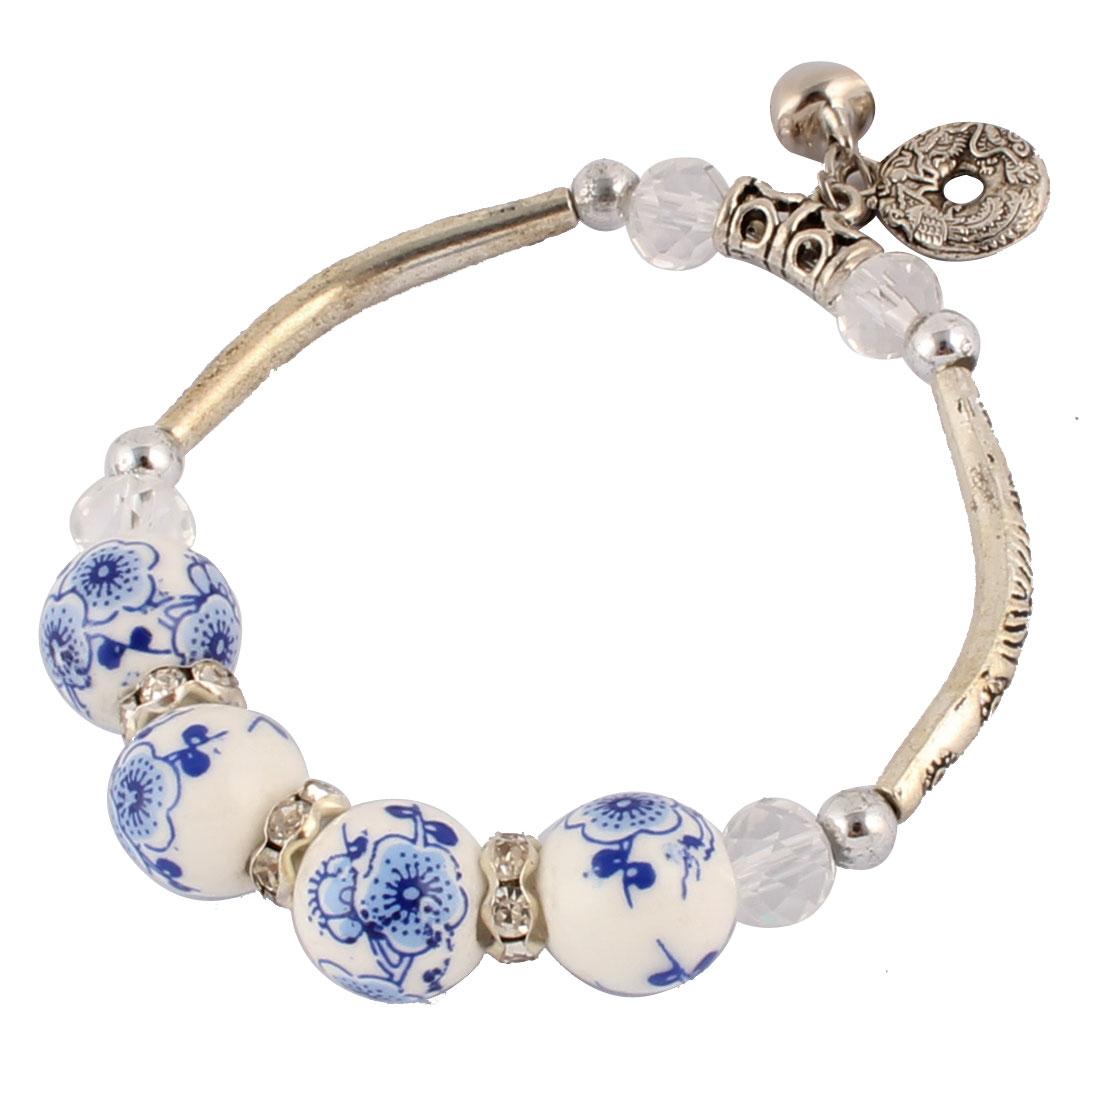 Women Ring Shape Pendant Small Bell Decor Wrist Bracelet Bangle 12mm Dia